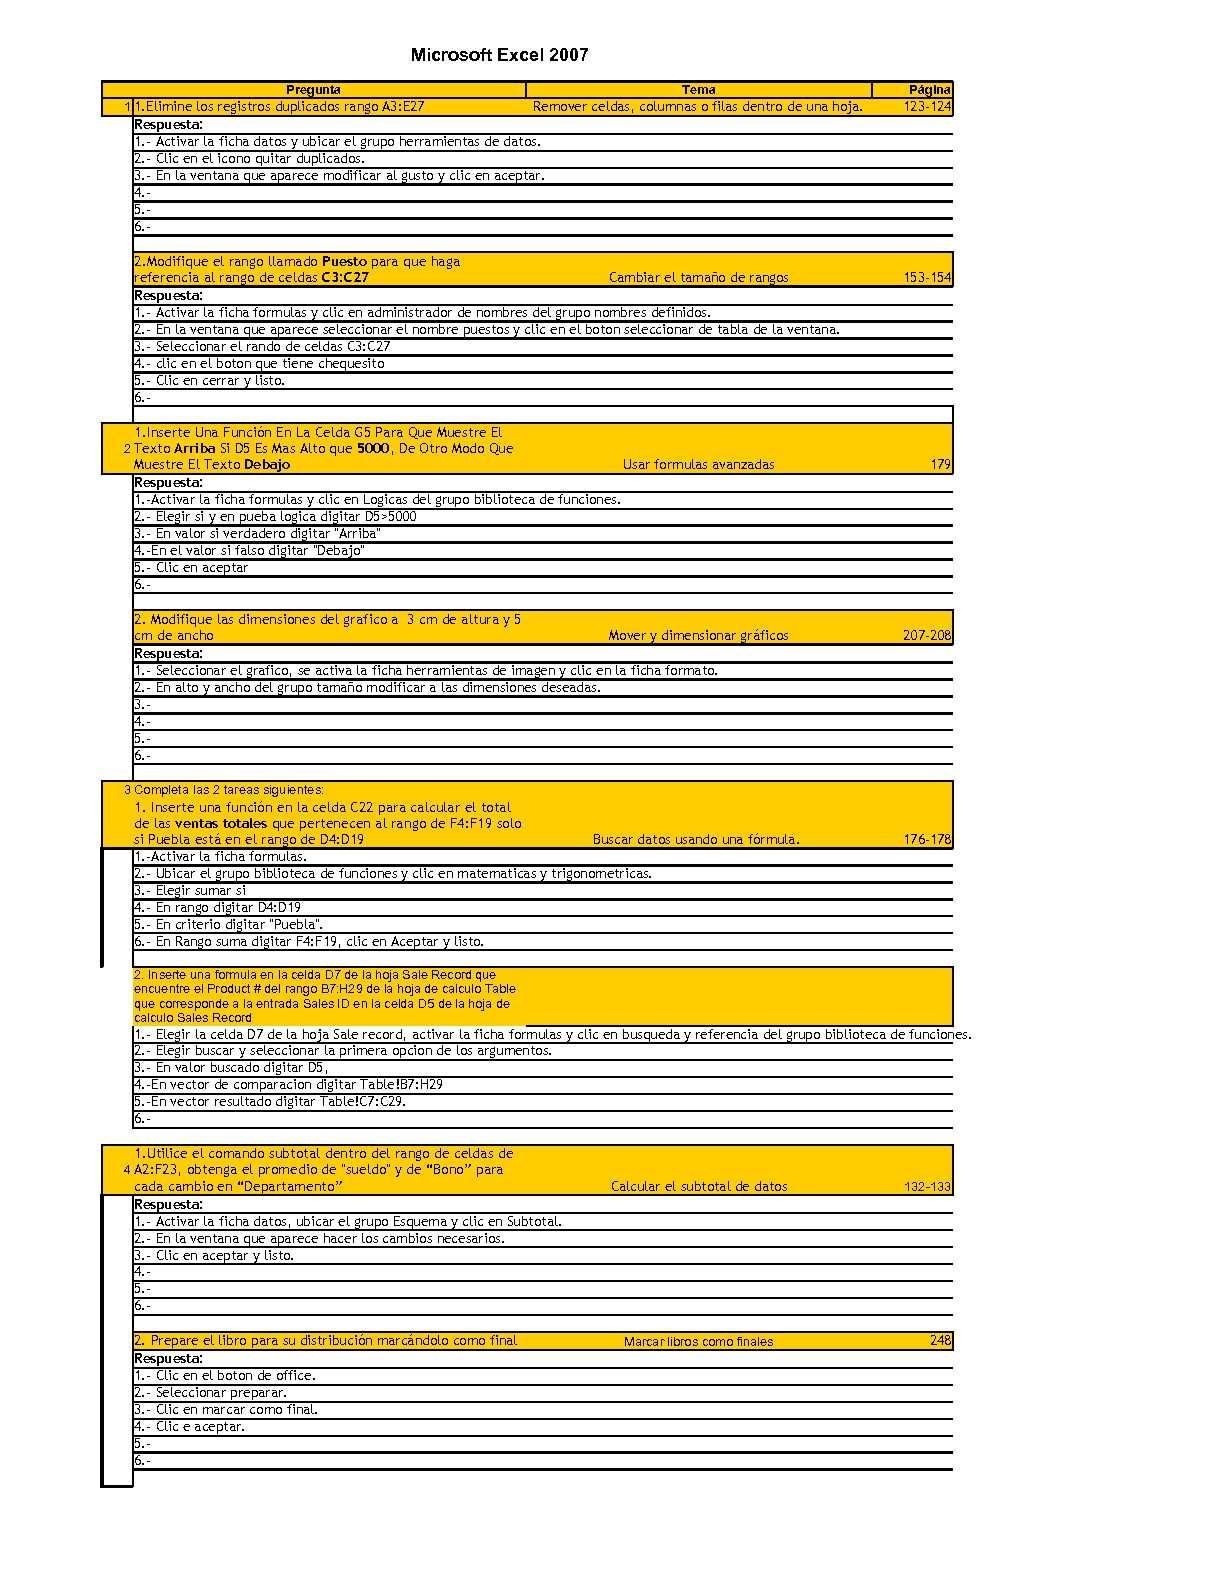 Calaméo - Preguntas Excel 2007